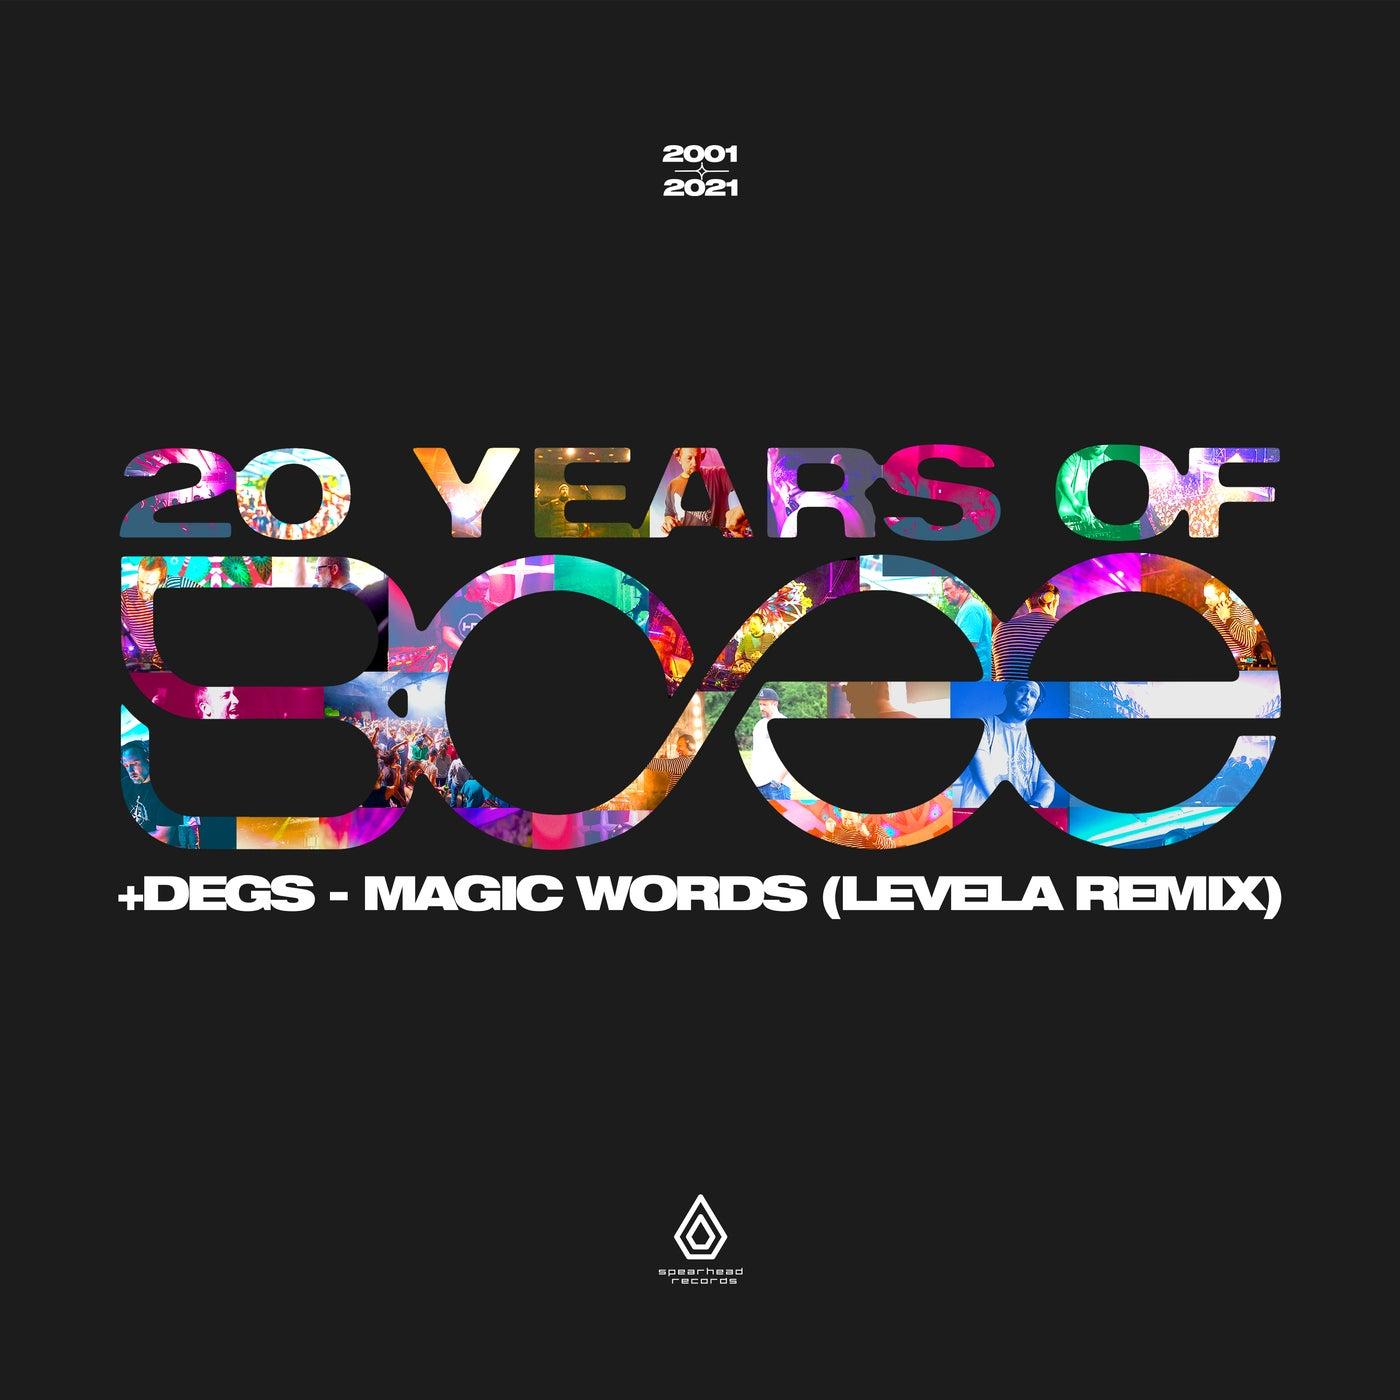 Magic Words (Levela Remix)